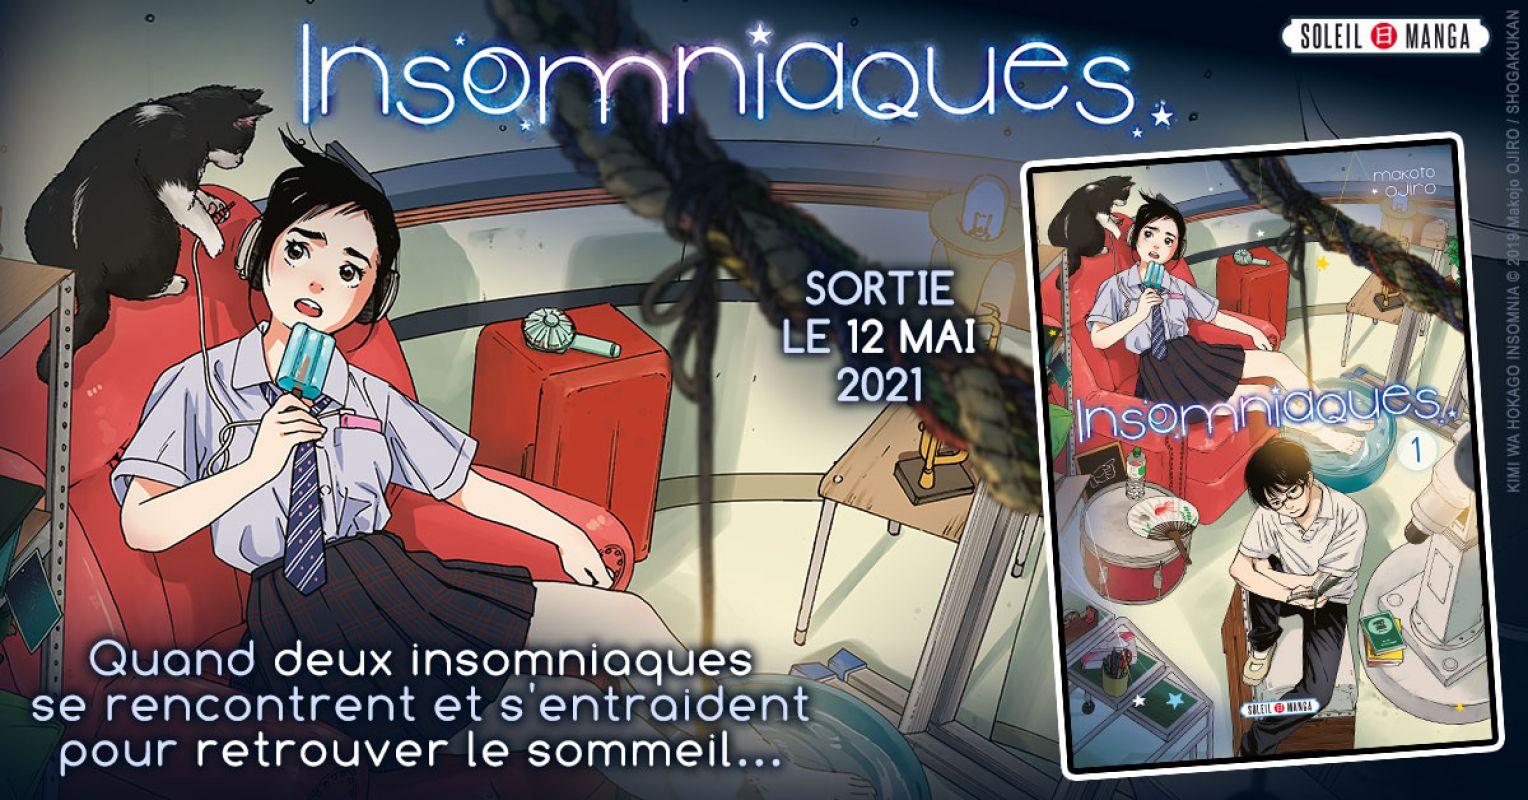 Insomniaques chez Soleil Manga